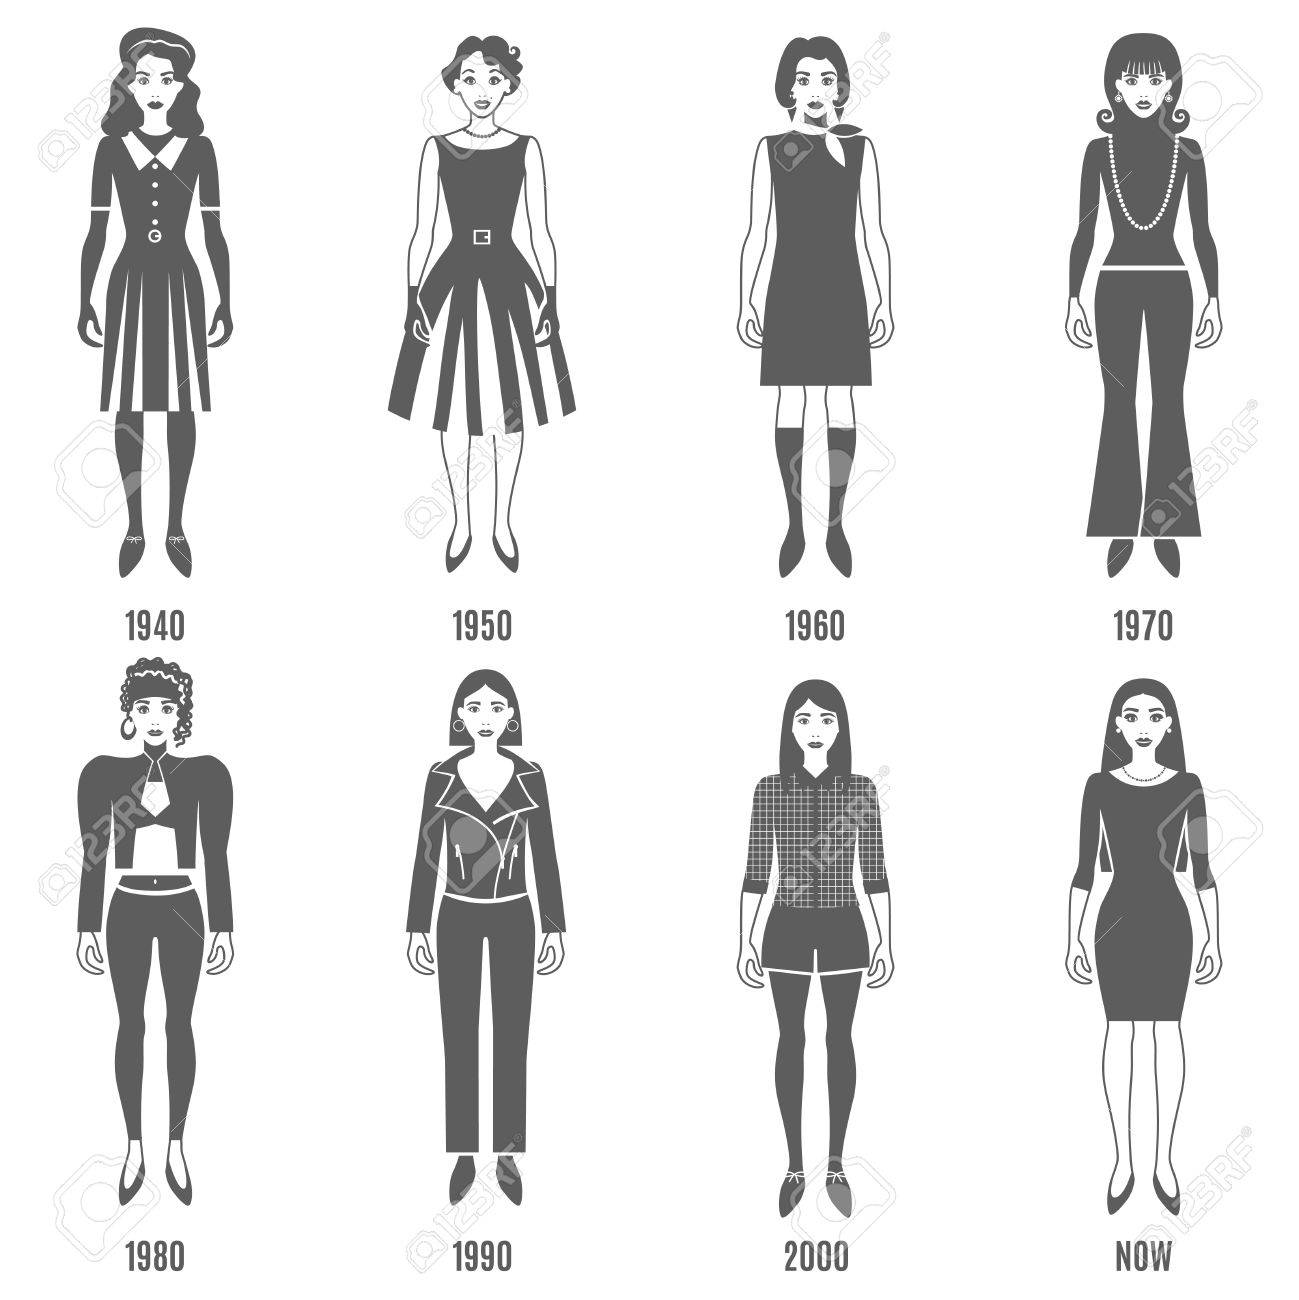 Women Fashion Black White Icons Set Fashion Development Vector Royalty Free Cliparts Vectors And Stock Illustration Image 59353102